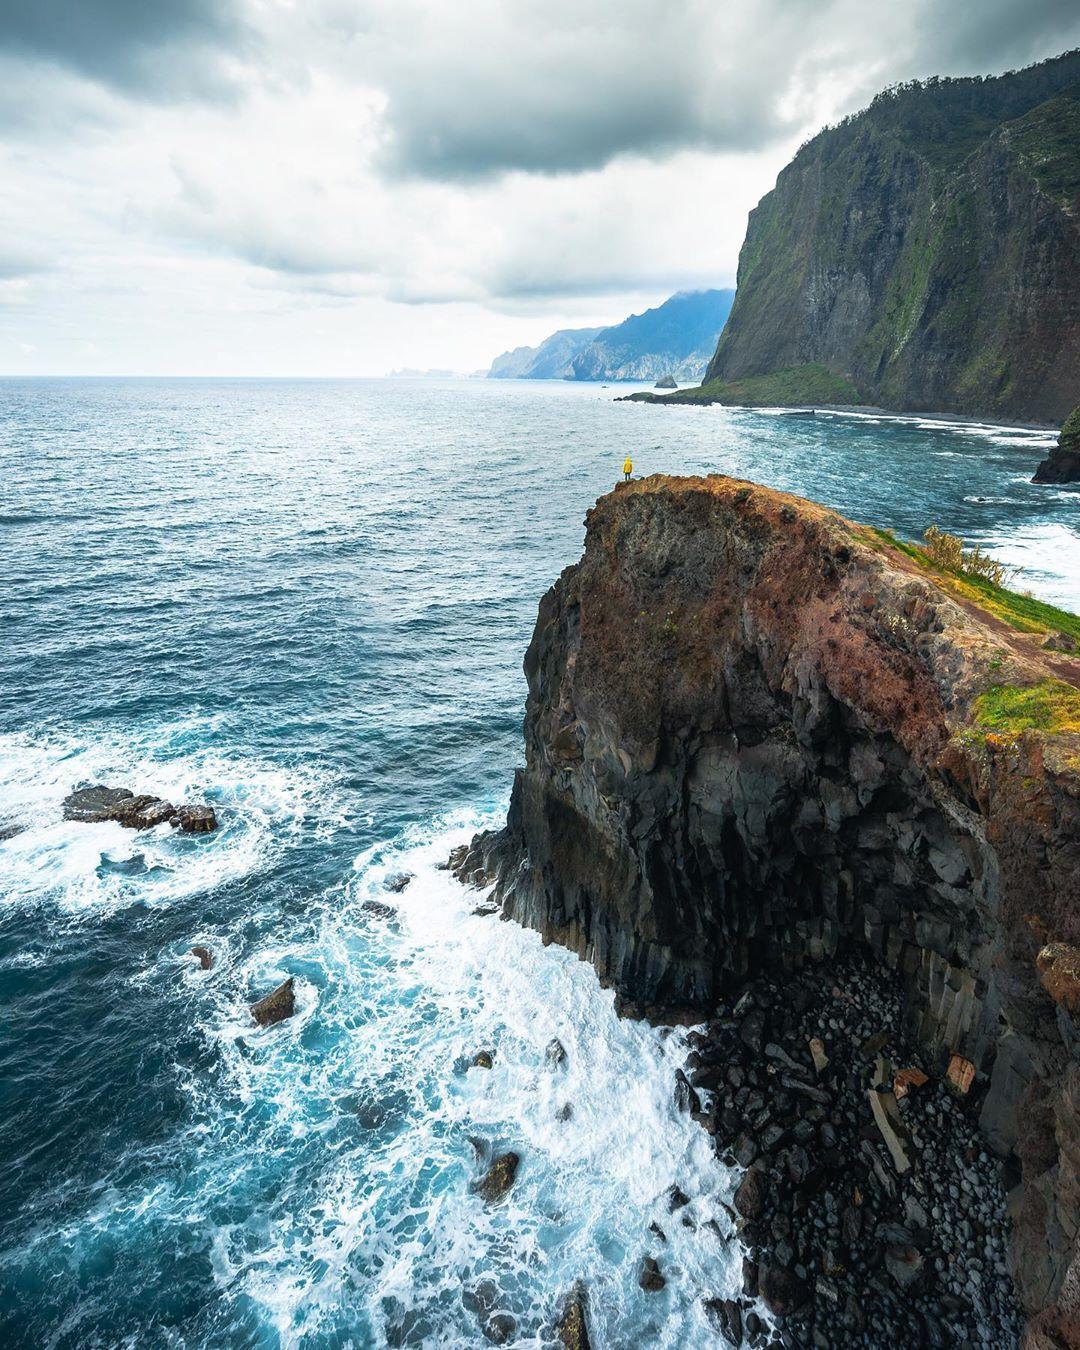 Атмосферные пейзажи от Джеймса Тео